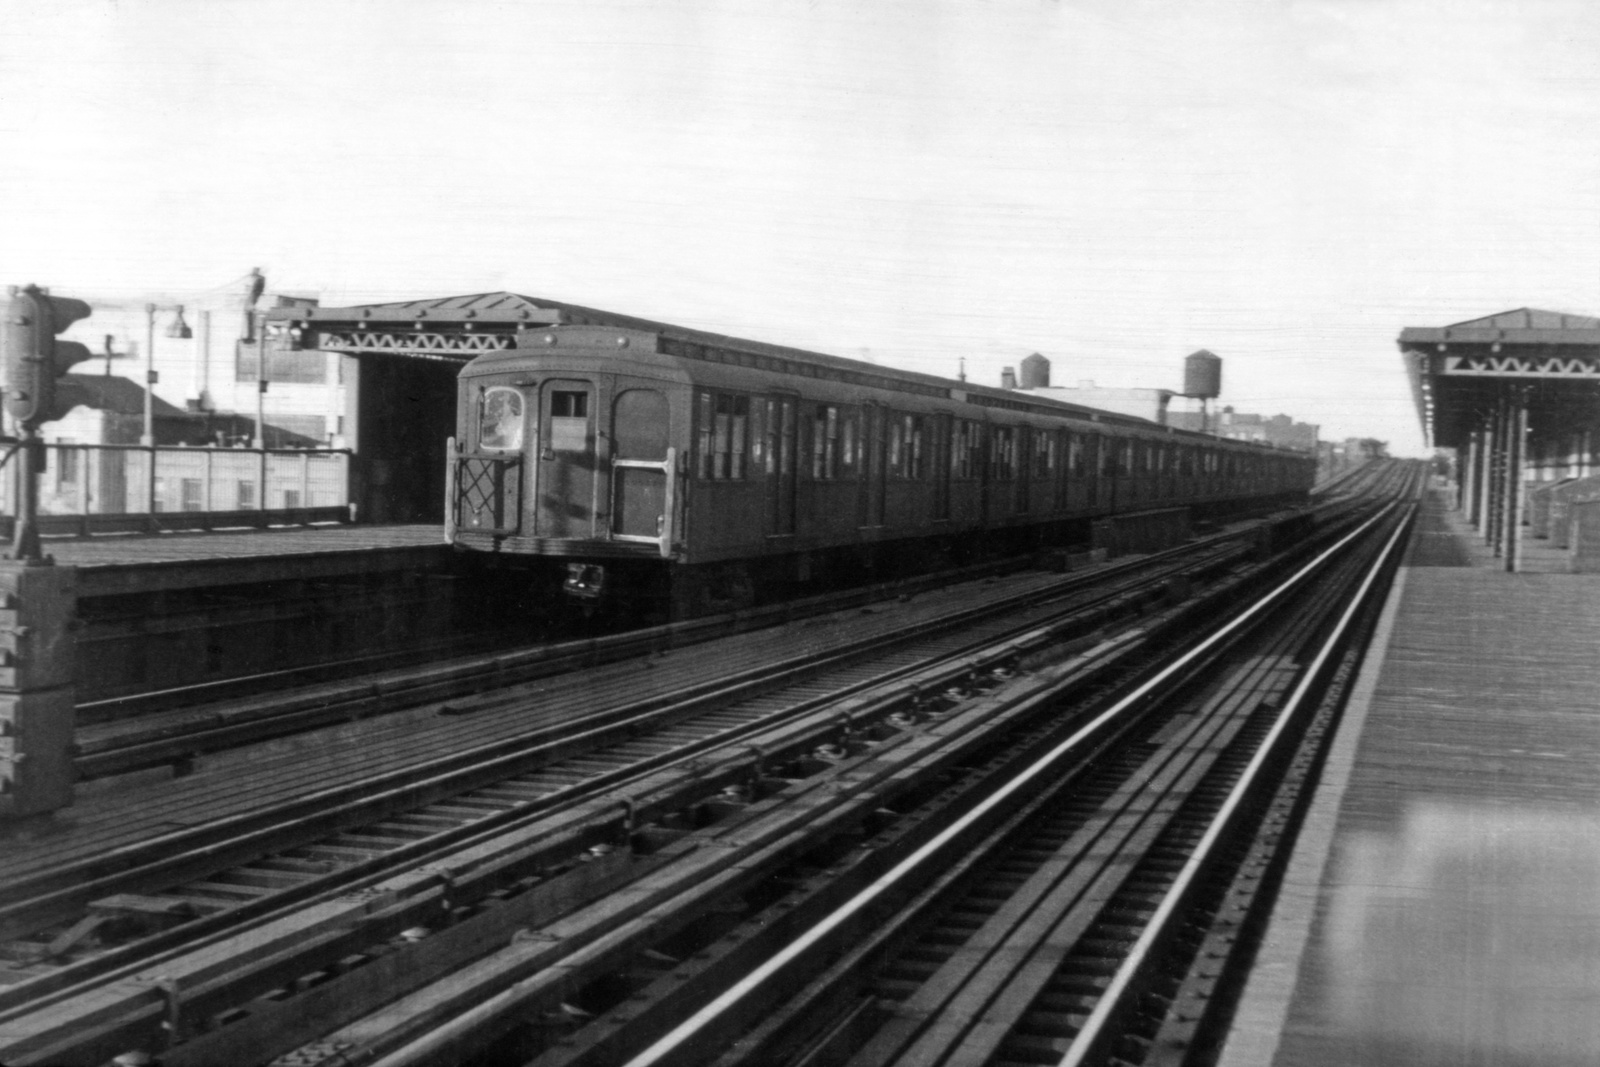 (142k, 1024x659)<br><b>Country:</b> United States<br><b>City:</b> New York<br><b>System:</b> New York City Transit<br><b>Line:</b> BMT Astoria Line<br><b>Location:</b> 39th/Beebe Aves. <br><b>Car:</b> BMT A/B-Type Standard  <br><b>Collection of:</b> Joe Testagrose<br><b>Viewed (this week/total):</b> 0 / 3086